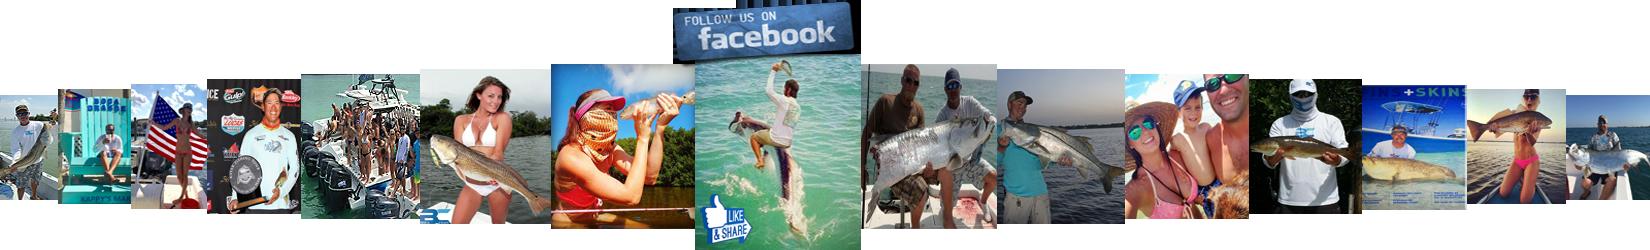 Fishing for tarpon snook and redfish